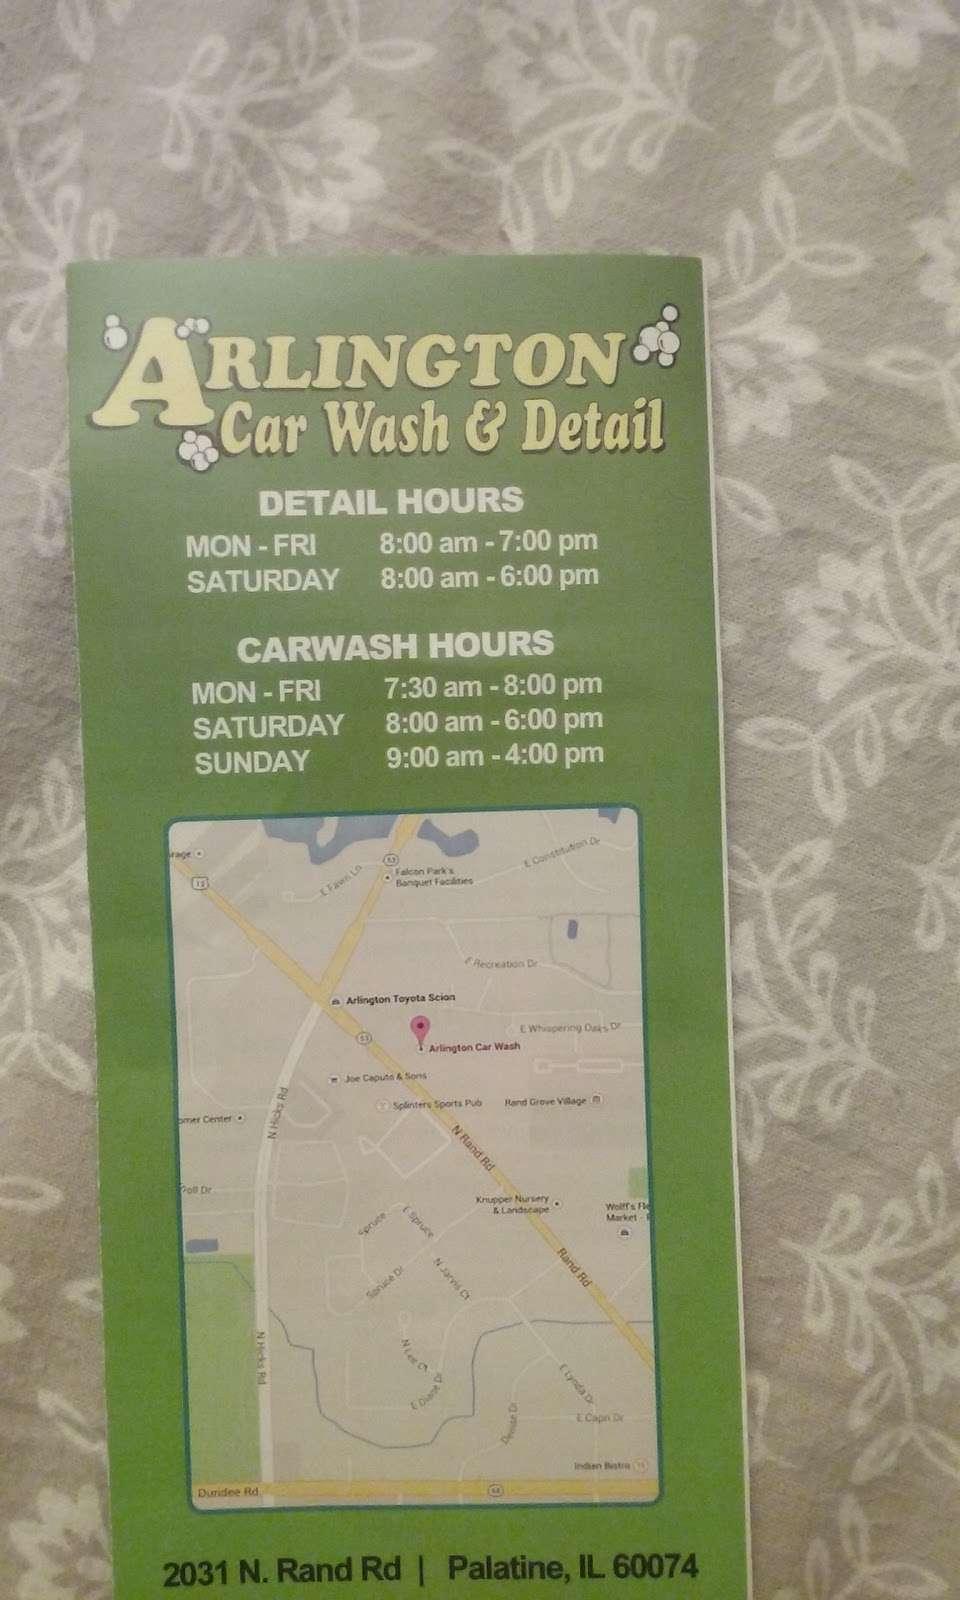 Arlington Car Wash - car wash  | Photo 5 of 5 | Address: 2031 N Rand Rd, Palatine, IL 60074, USA | Phone: (847) 485-1400